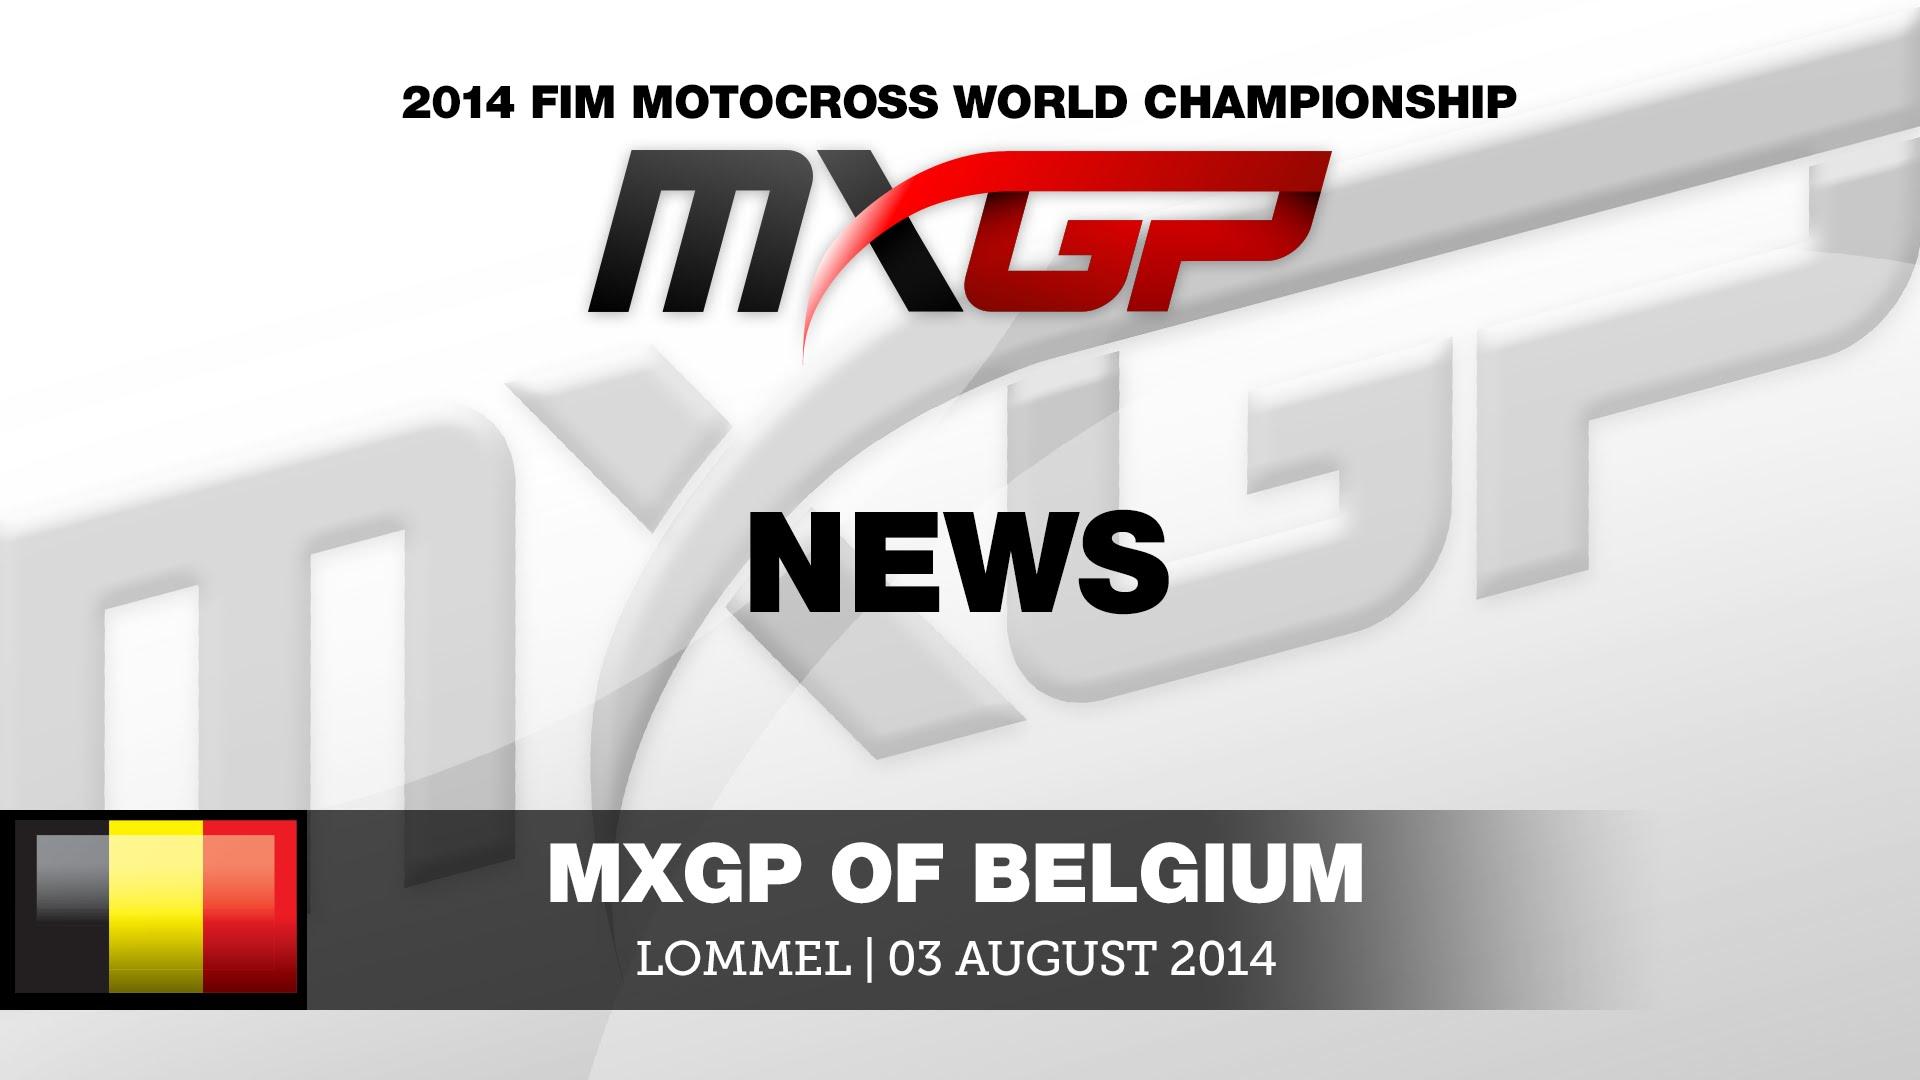 MXGP of Belgium 2014 - Highlights